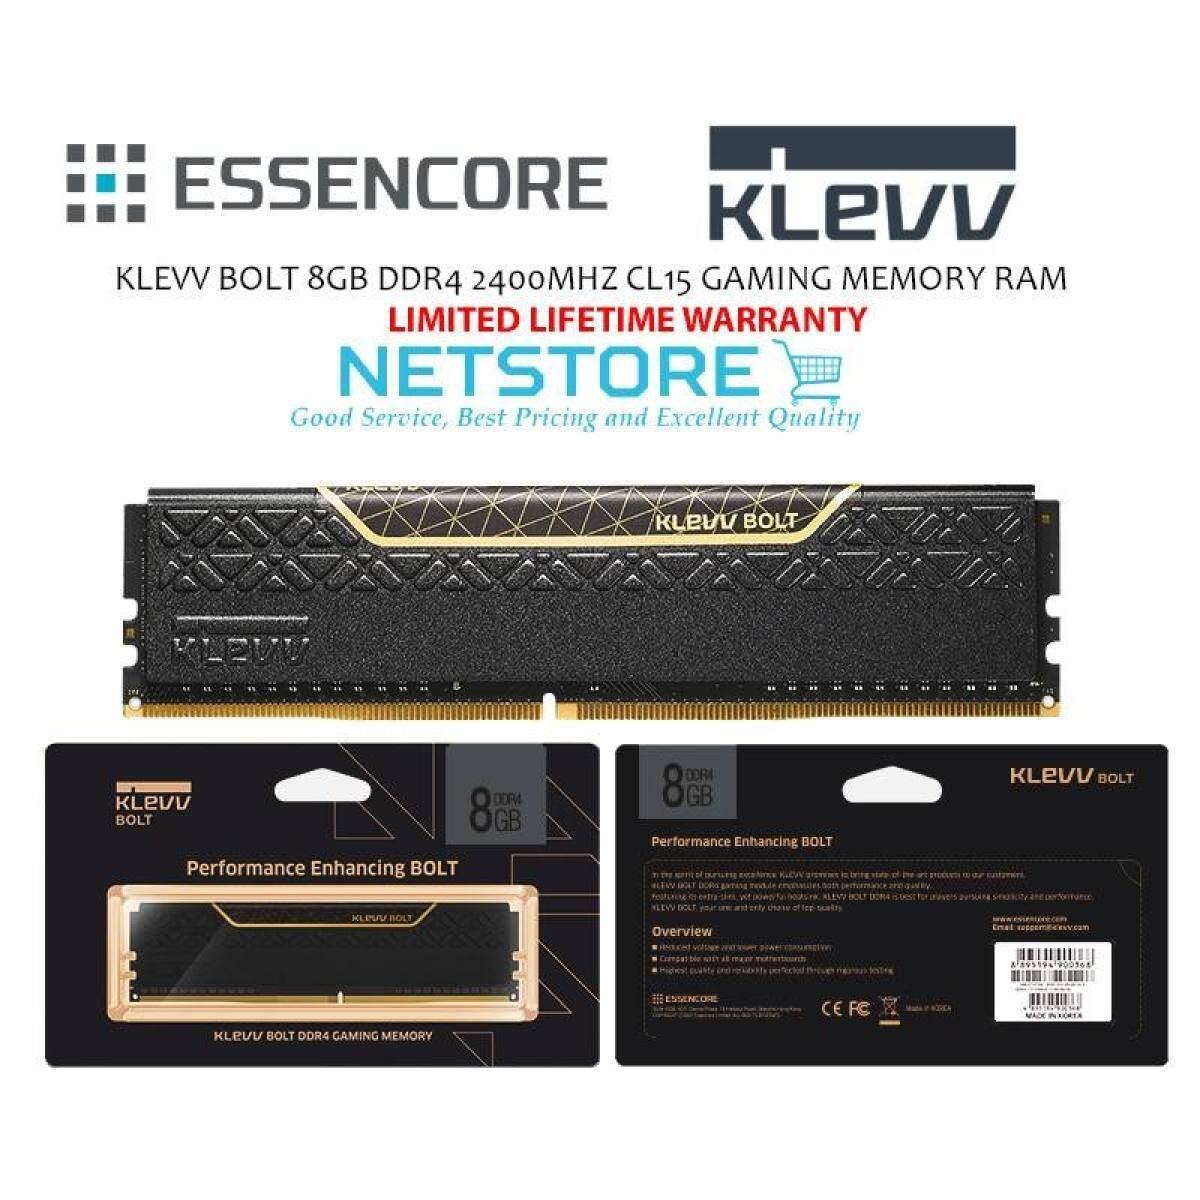 KLEVV BOLT 8GB DDR4 2400MHZ CL15 GAMING MEMORY RAM